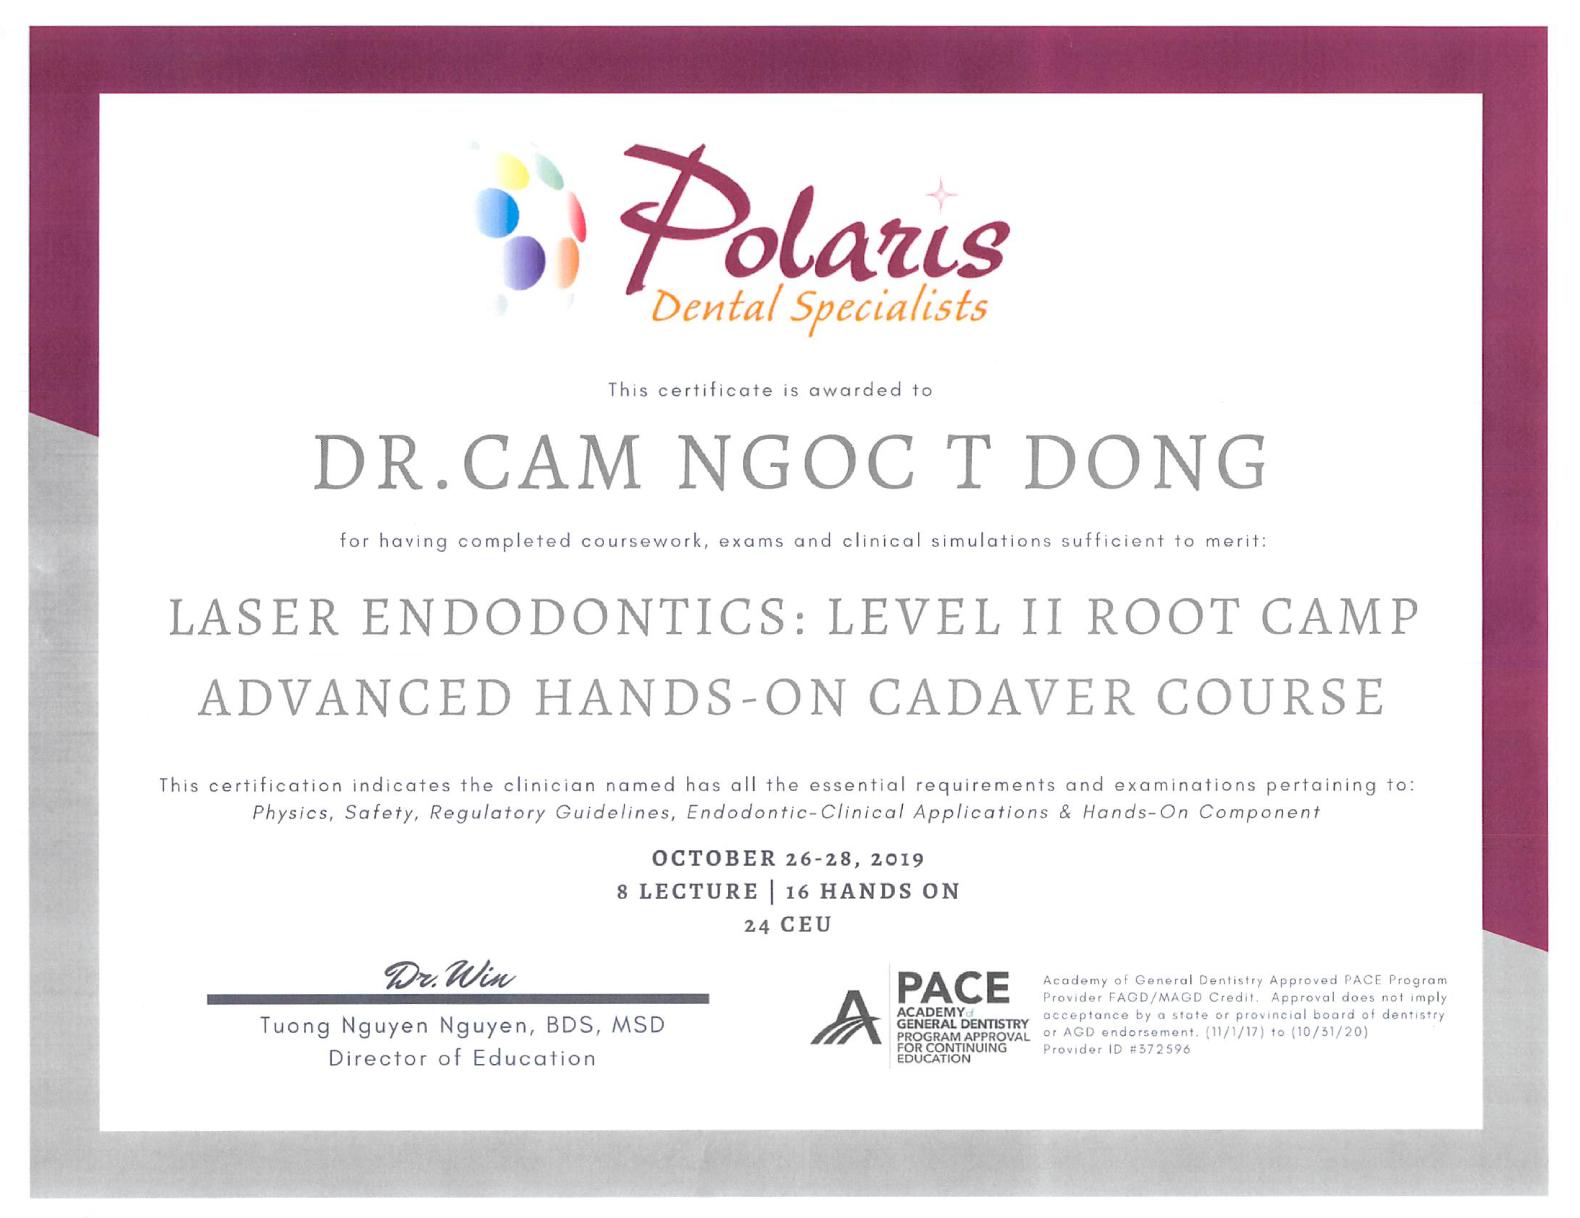 Polaris Laser Endo Root Camp hands on cadaver